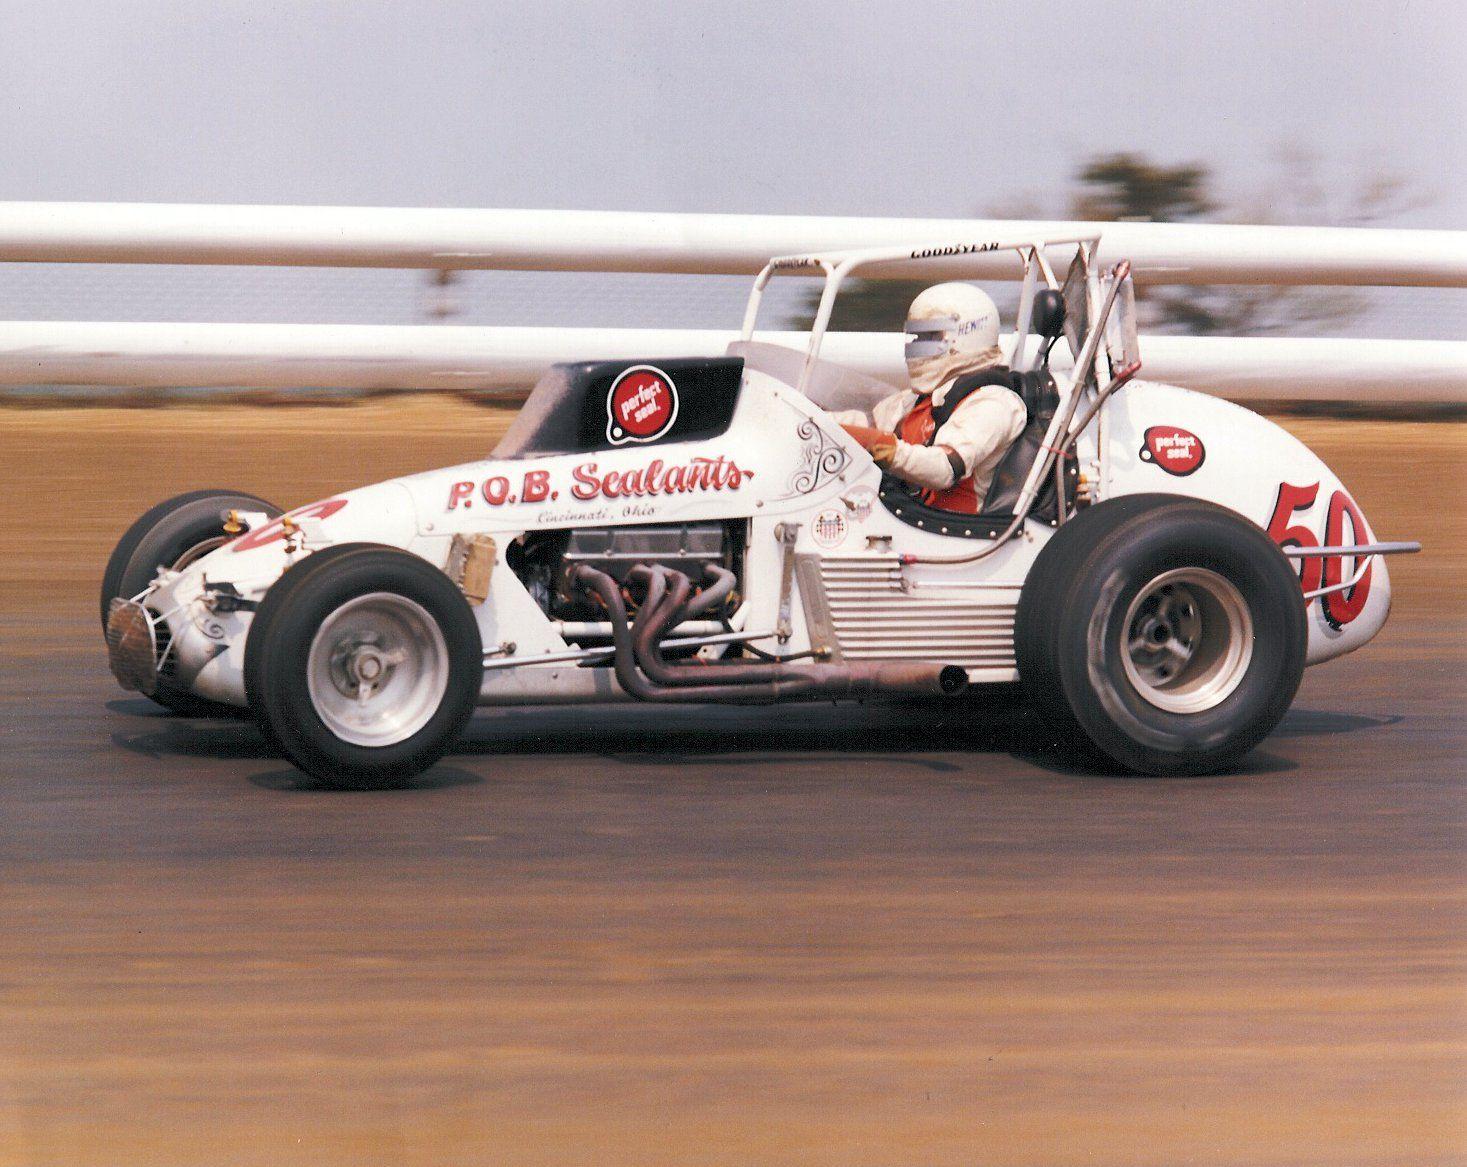 Sprint Car Jack : Usac champ car on dirt jack hewitt i think the